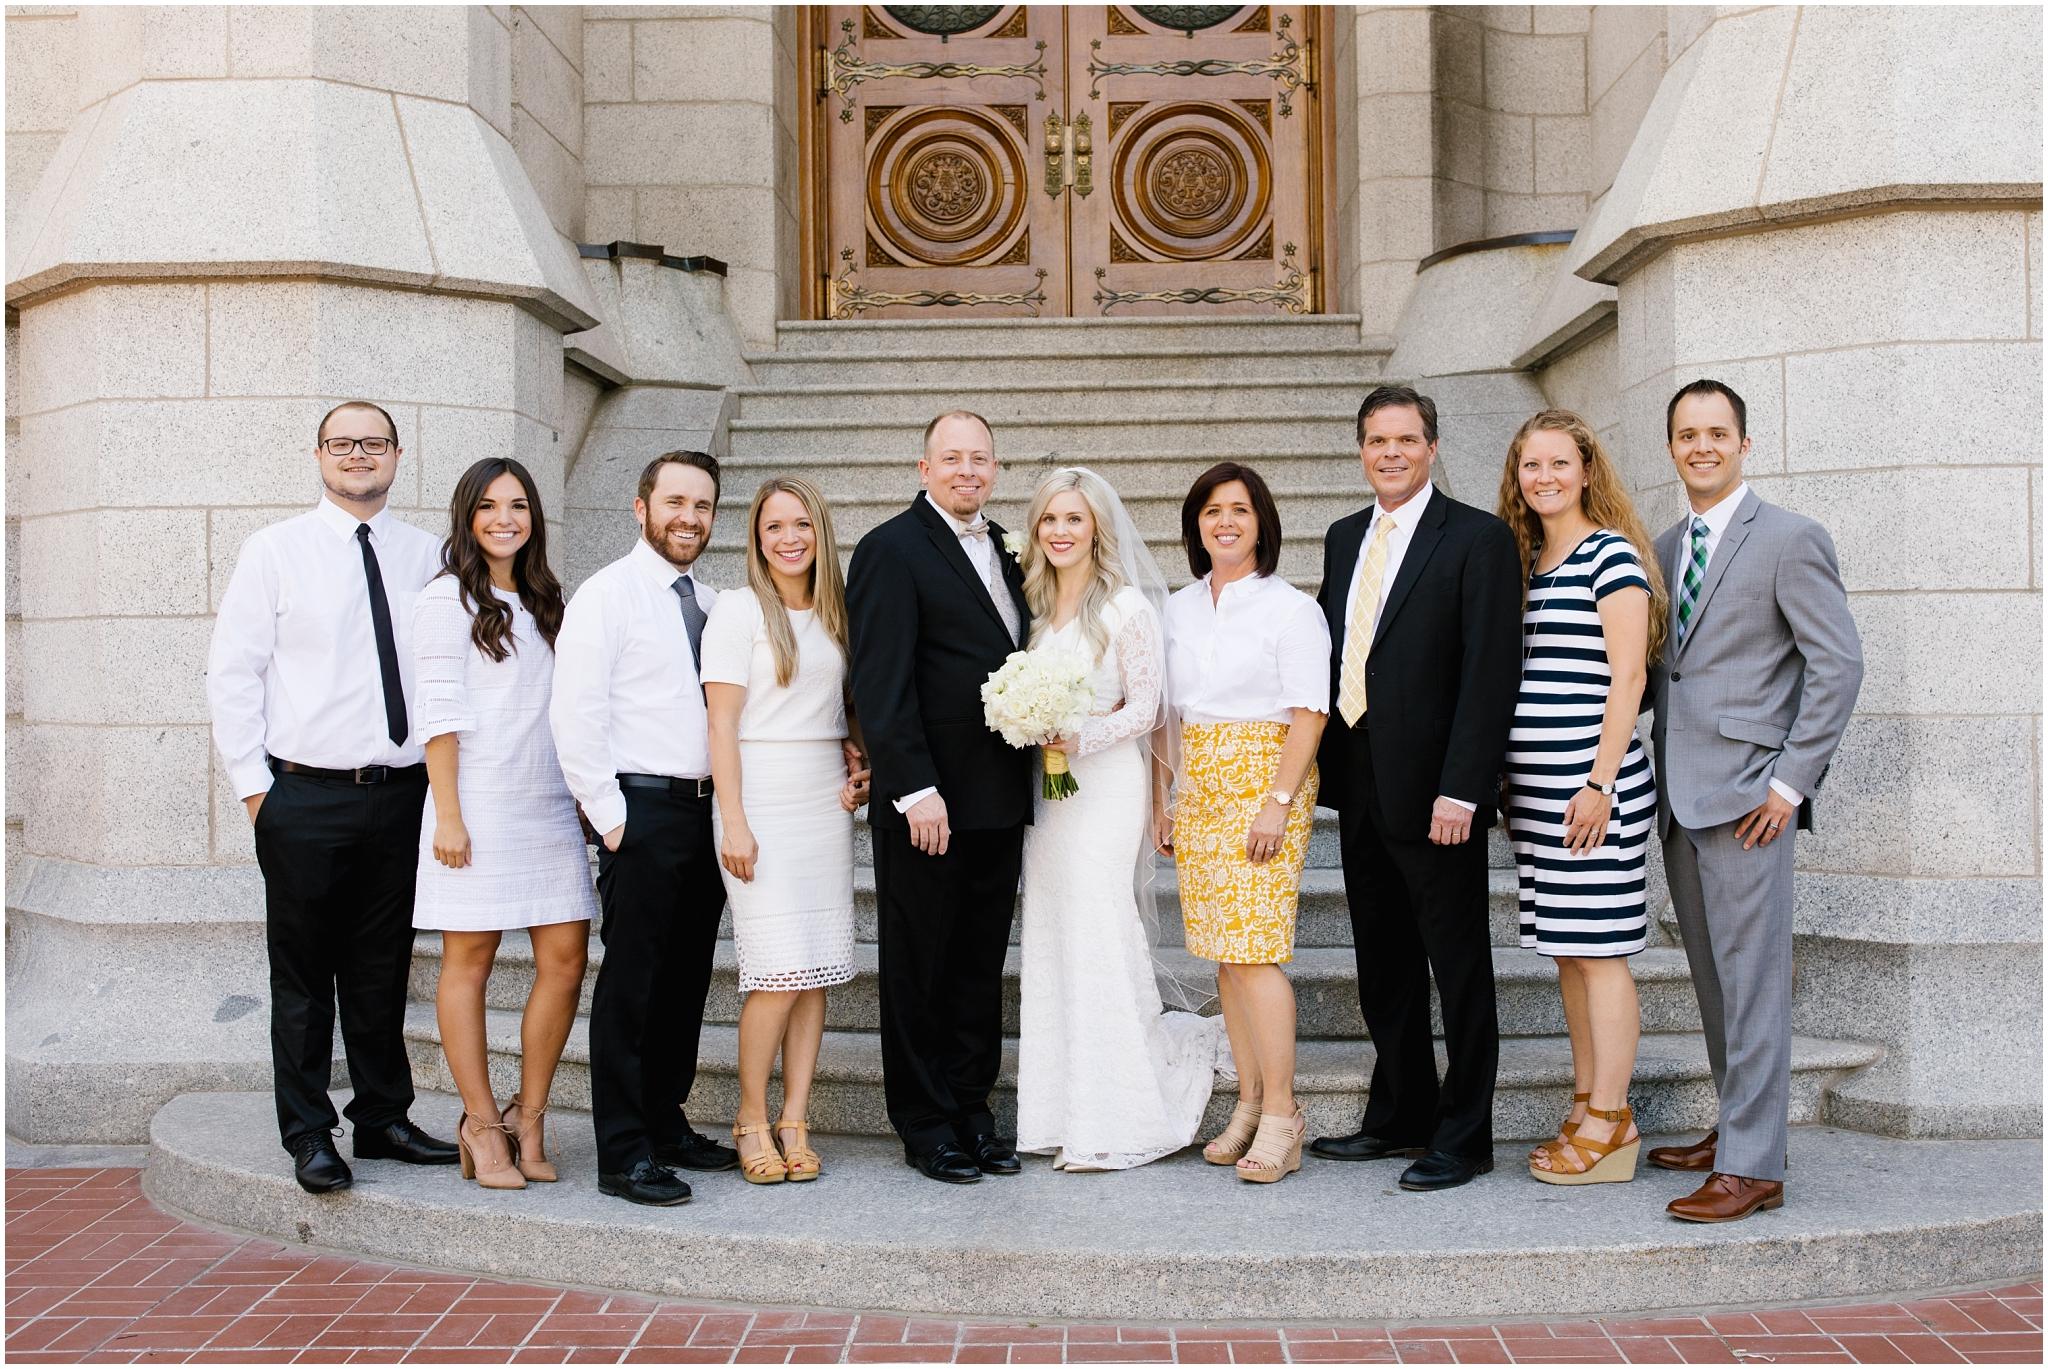 CherylandTyler-73_Lizzie-B-Imagery-Utah-Wedding-Photographer-Salt-Lake-City-Temple-Wells-Fargo-Building-Reception.jpg